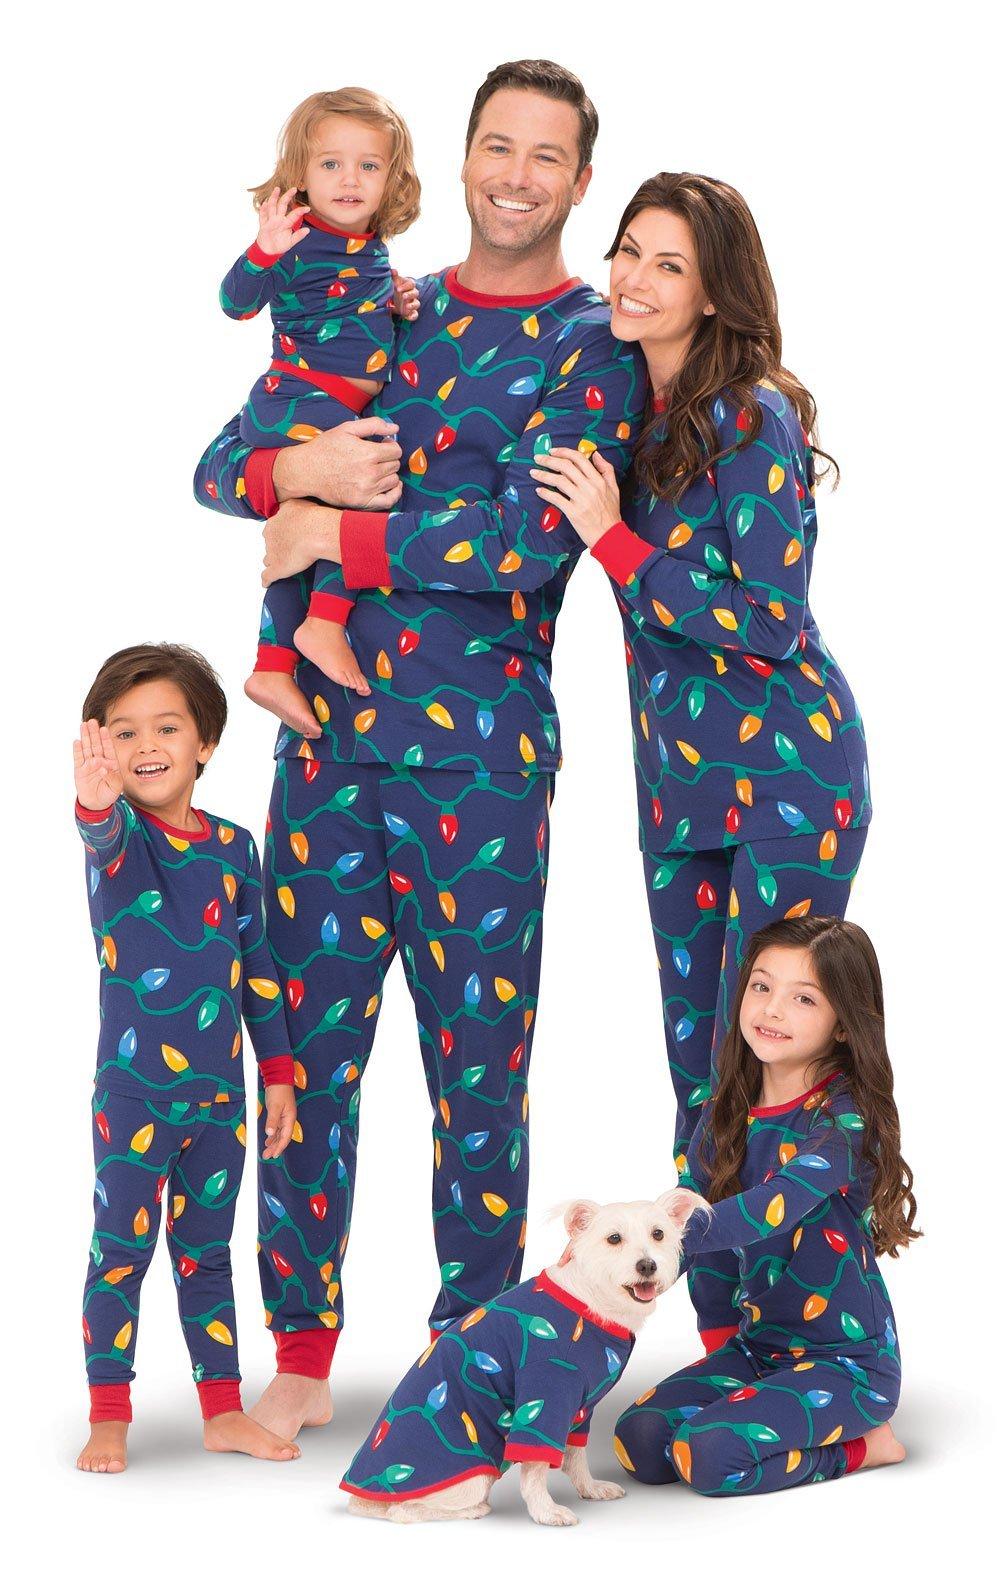 80a3fb6fe5 PajamaGram Christmas Lights Matching Family Pajama Set, Blue ...